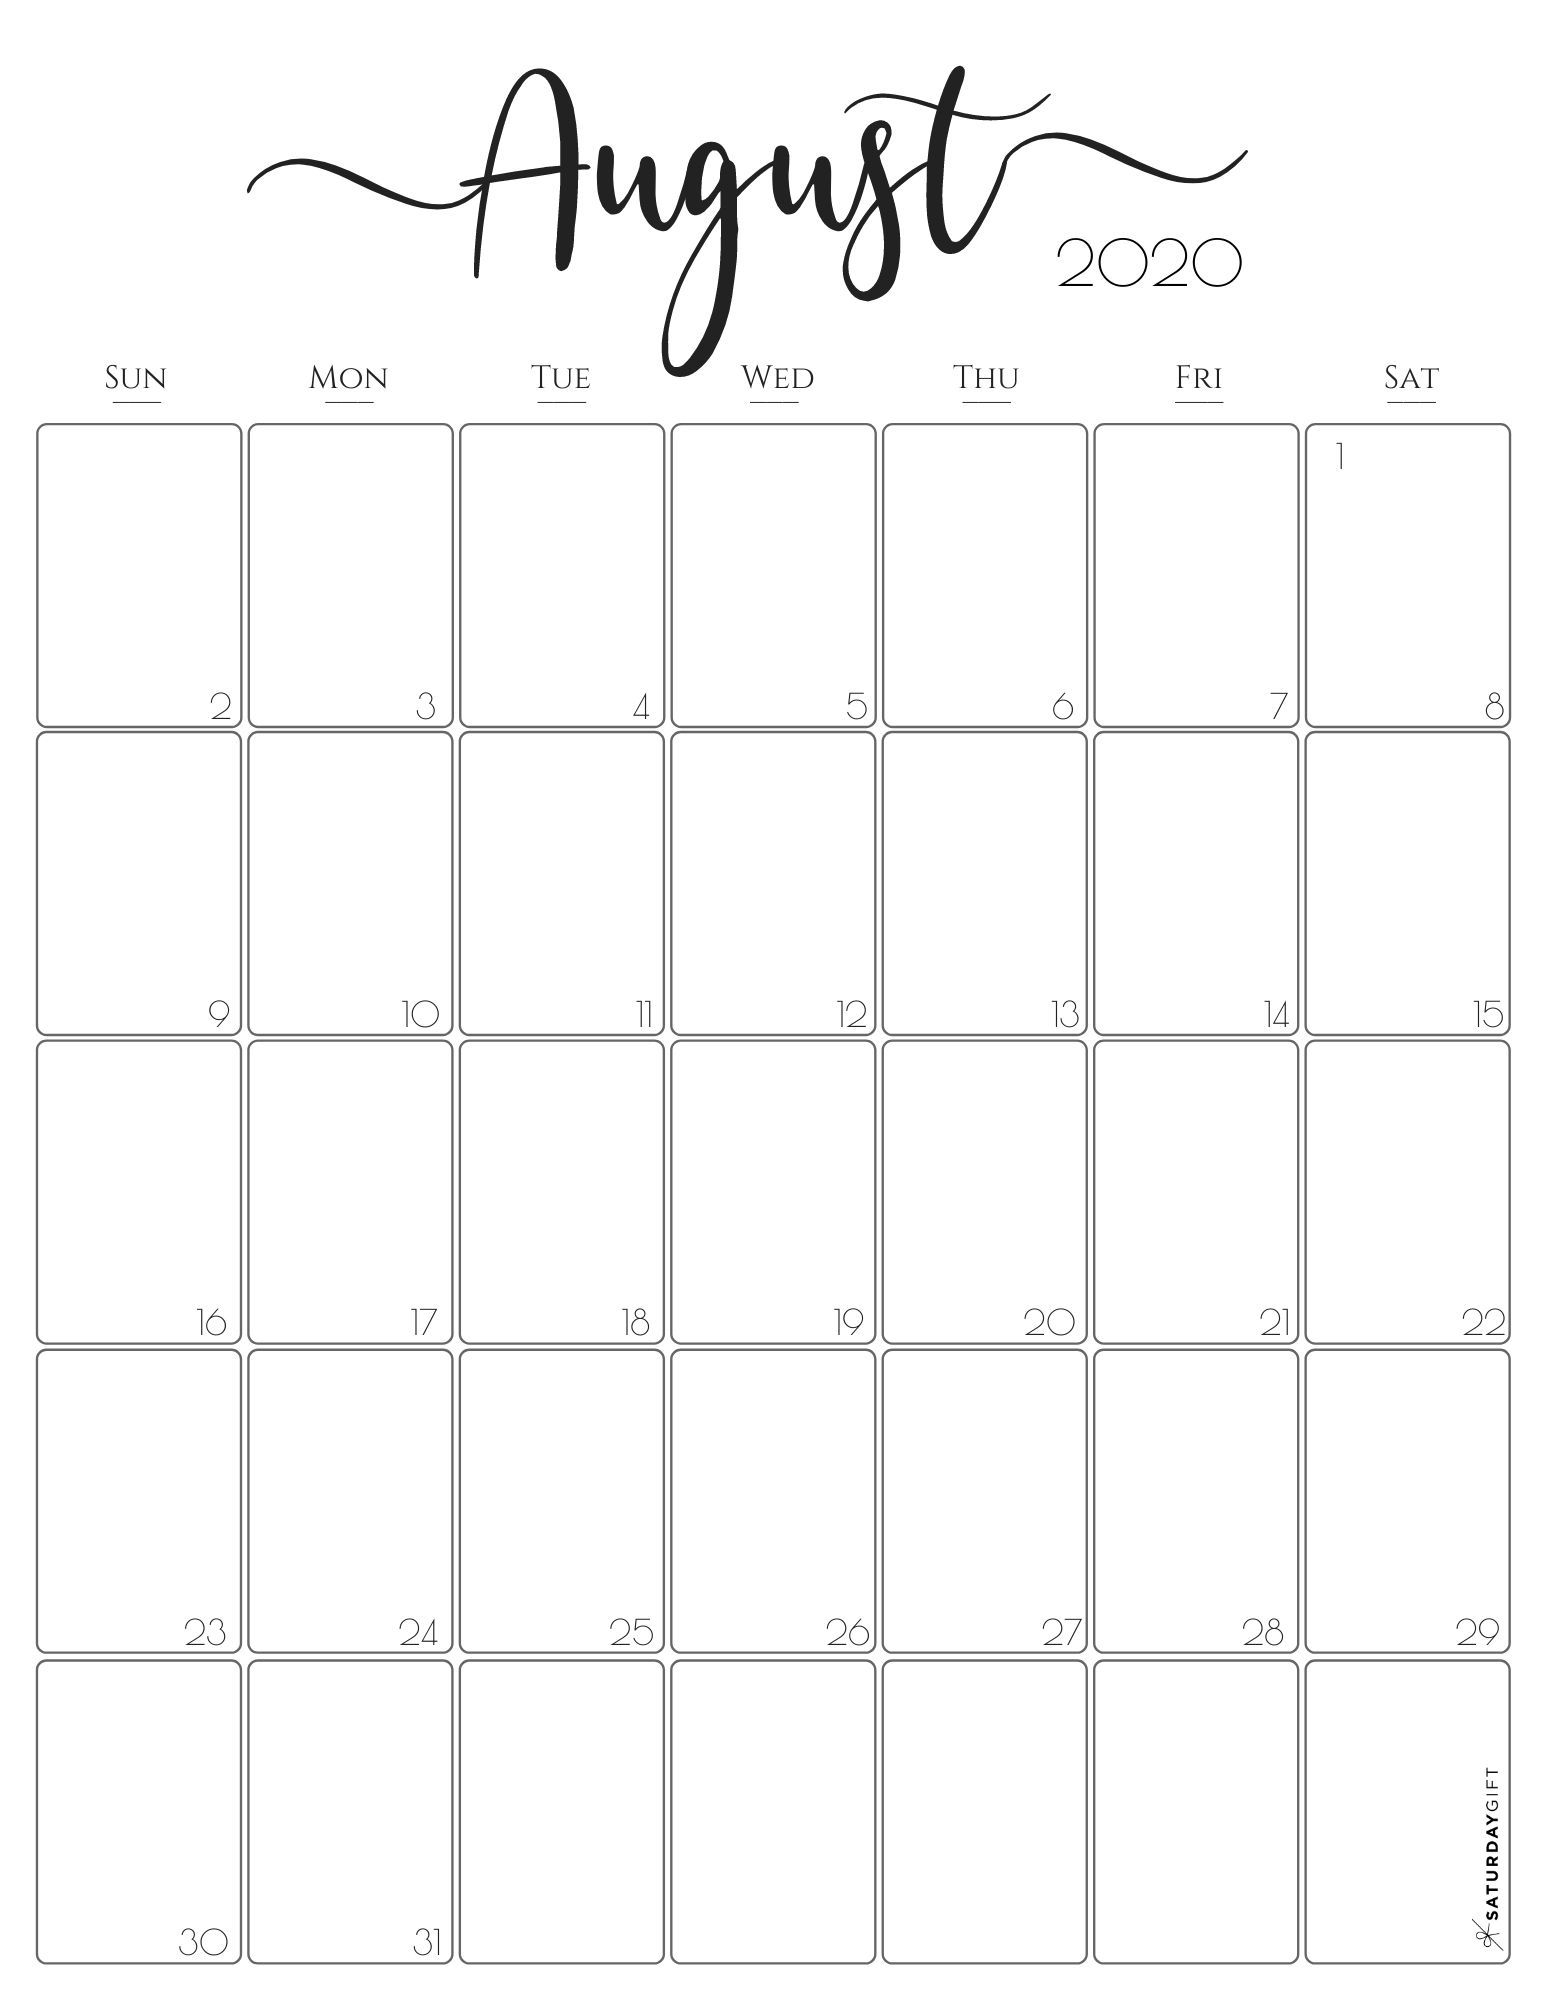 Catch August Calendar Print Out